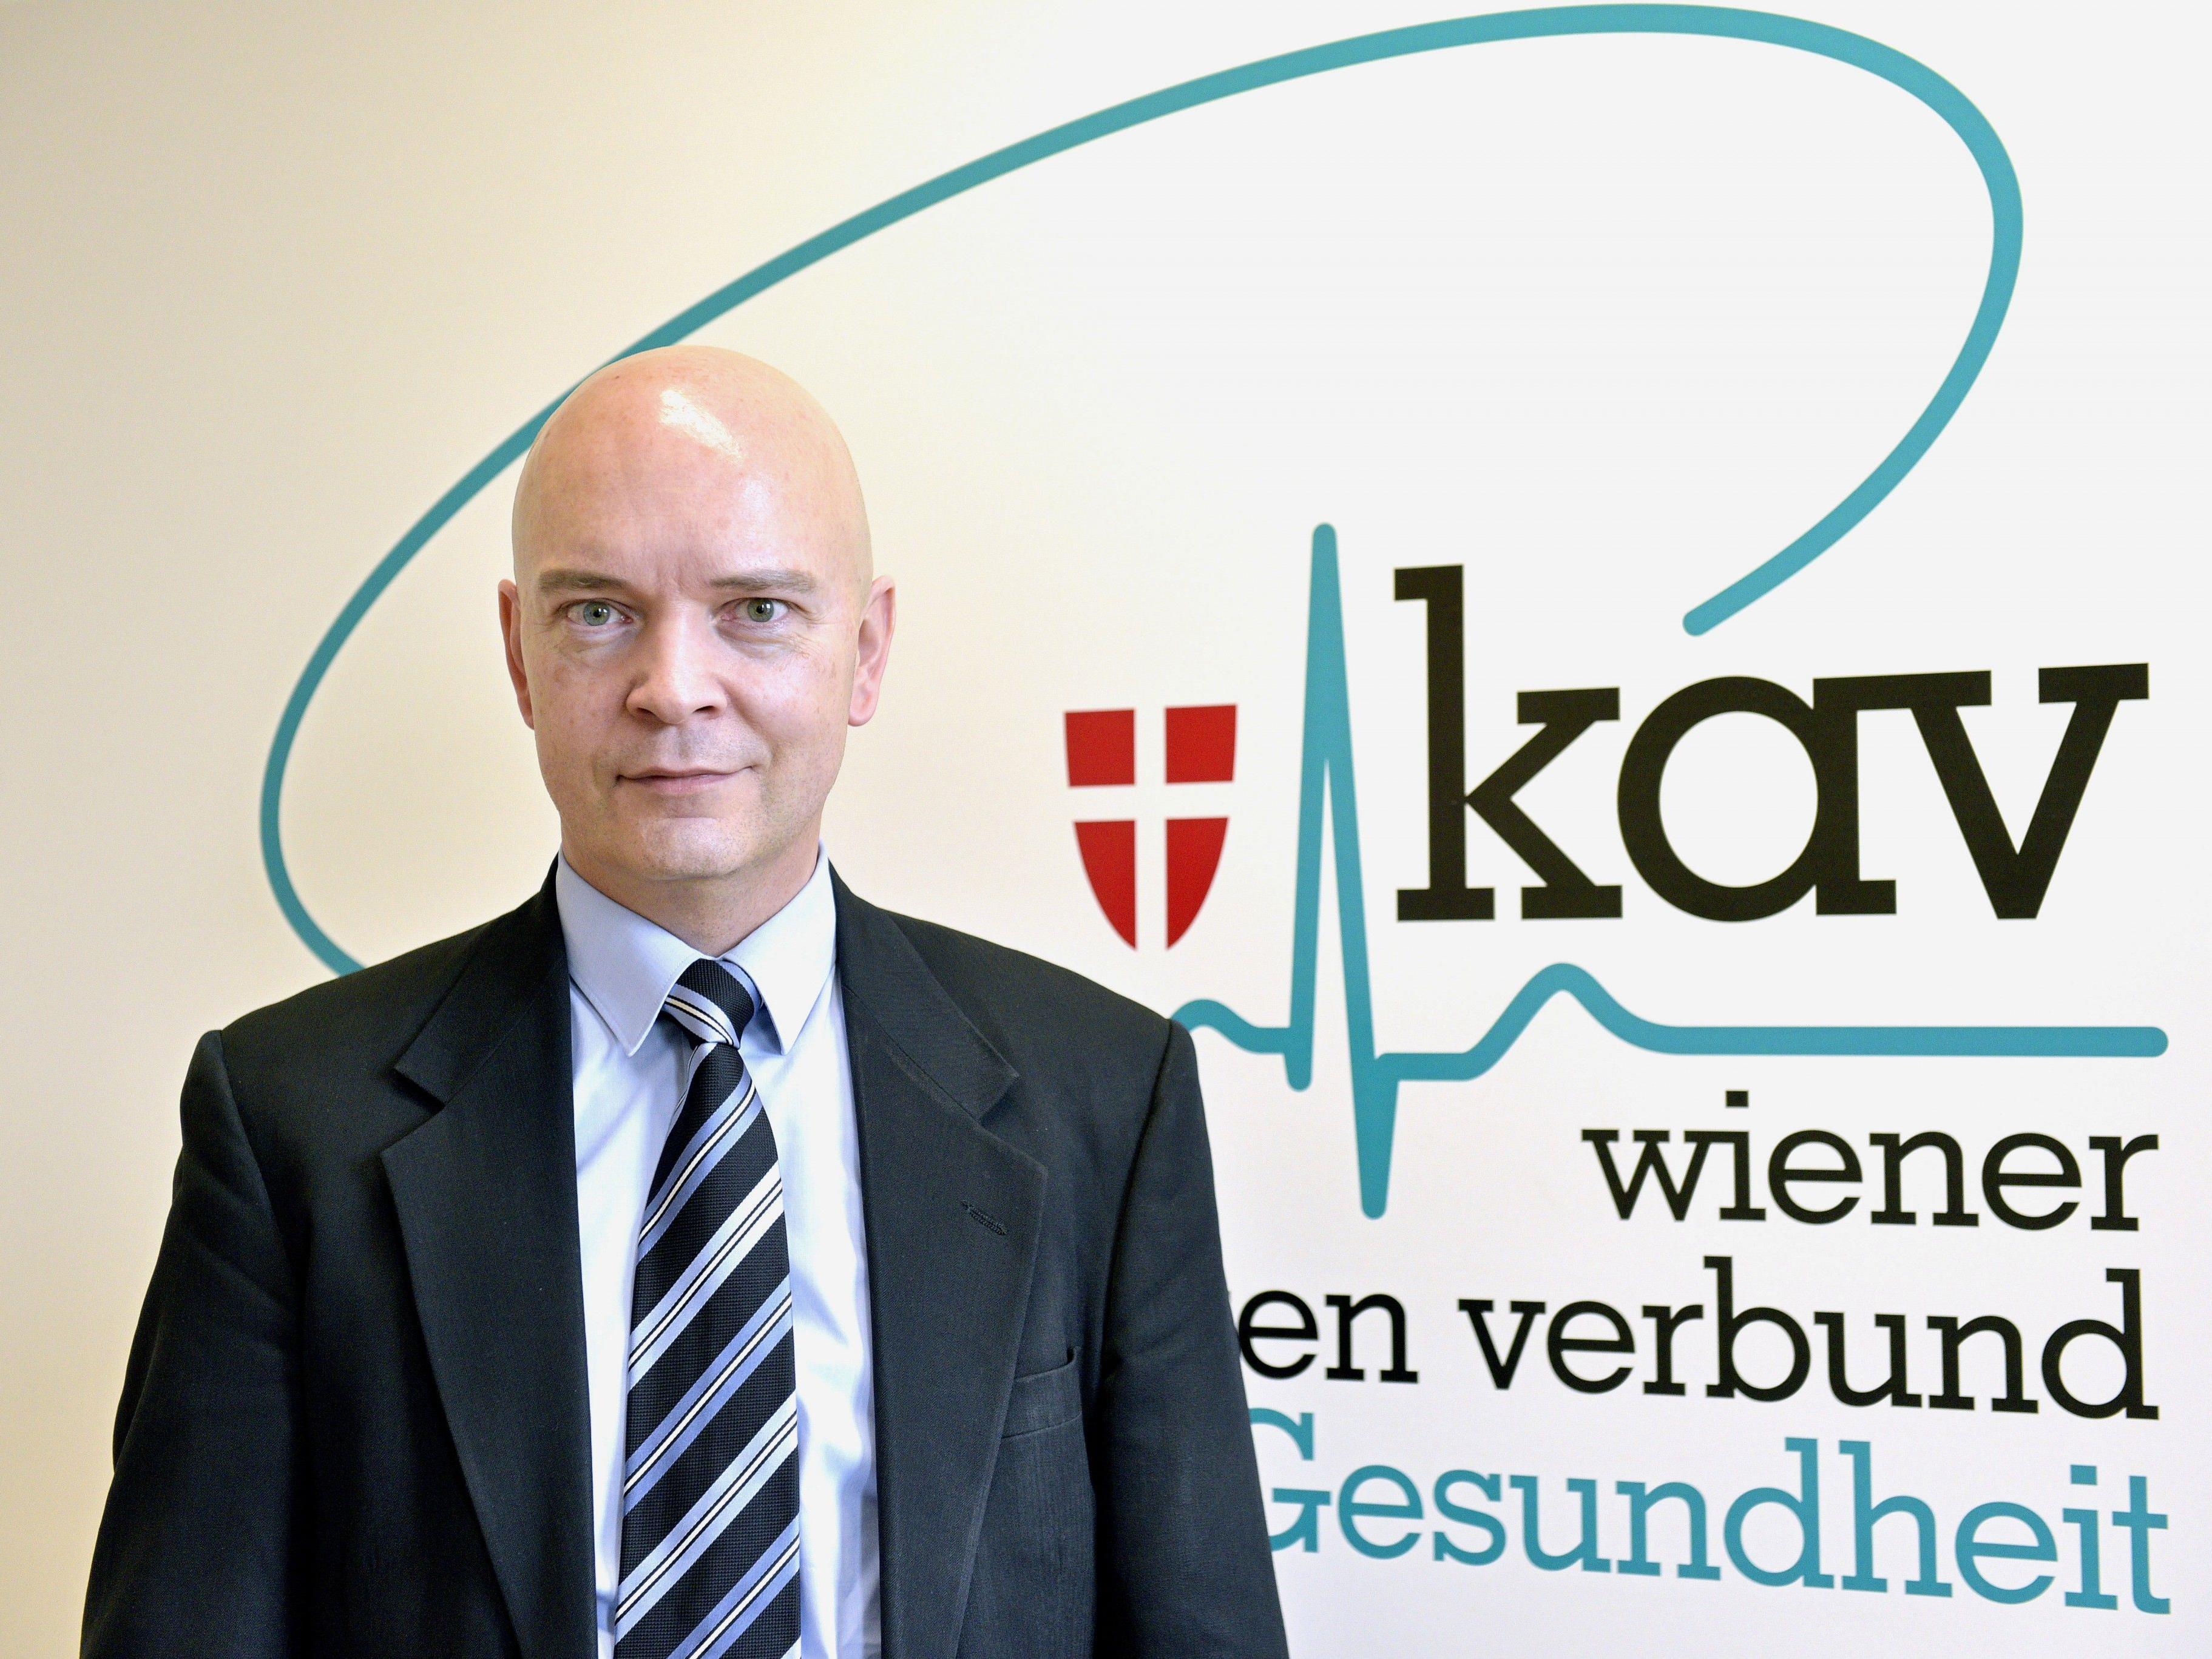 KAV Wien-Generaldirektor Udo Janßen geht